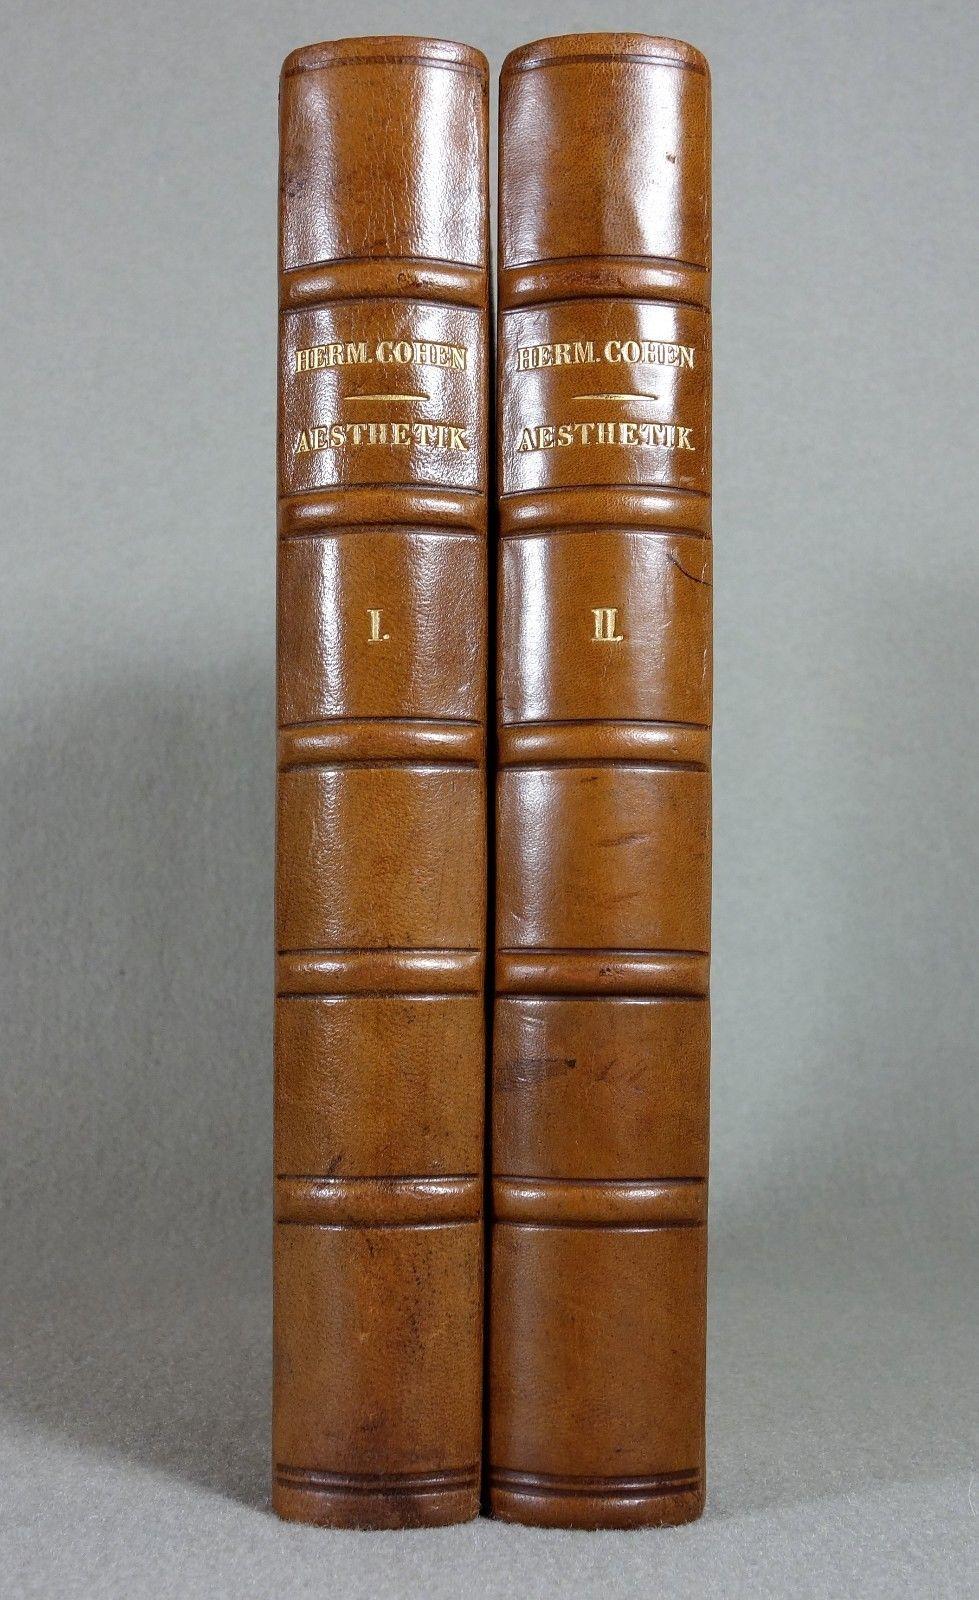 Hermann Cohen - LEDER Philosophie Erstausgabe Judaica - RAR